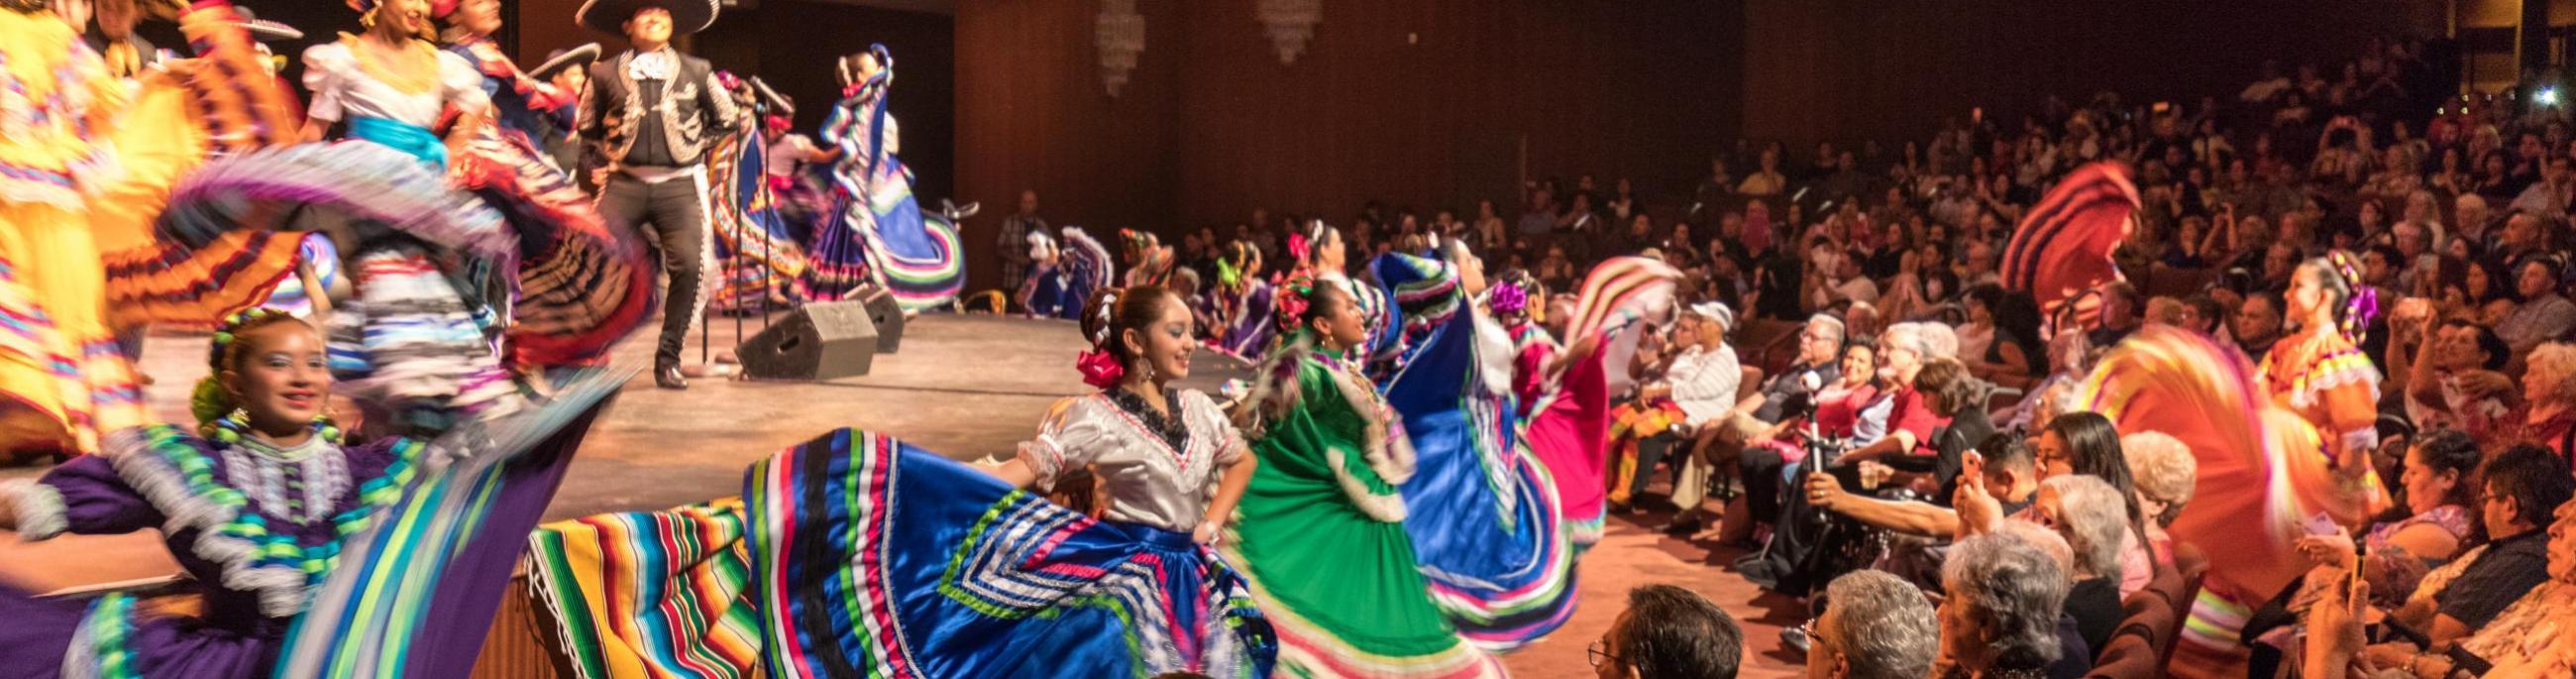 Chandler Center for the Arts Celebrates Hispanic Heritage Month